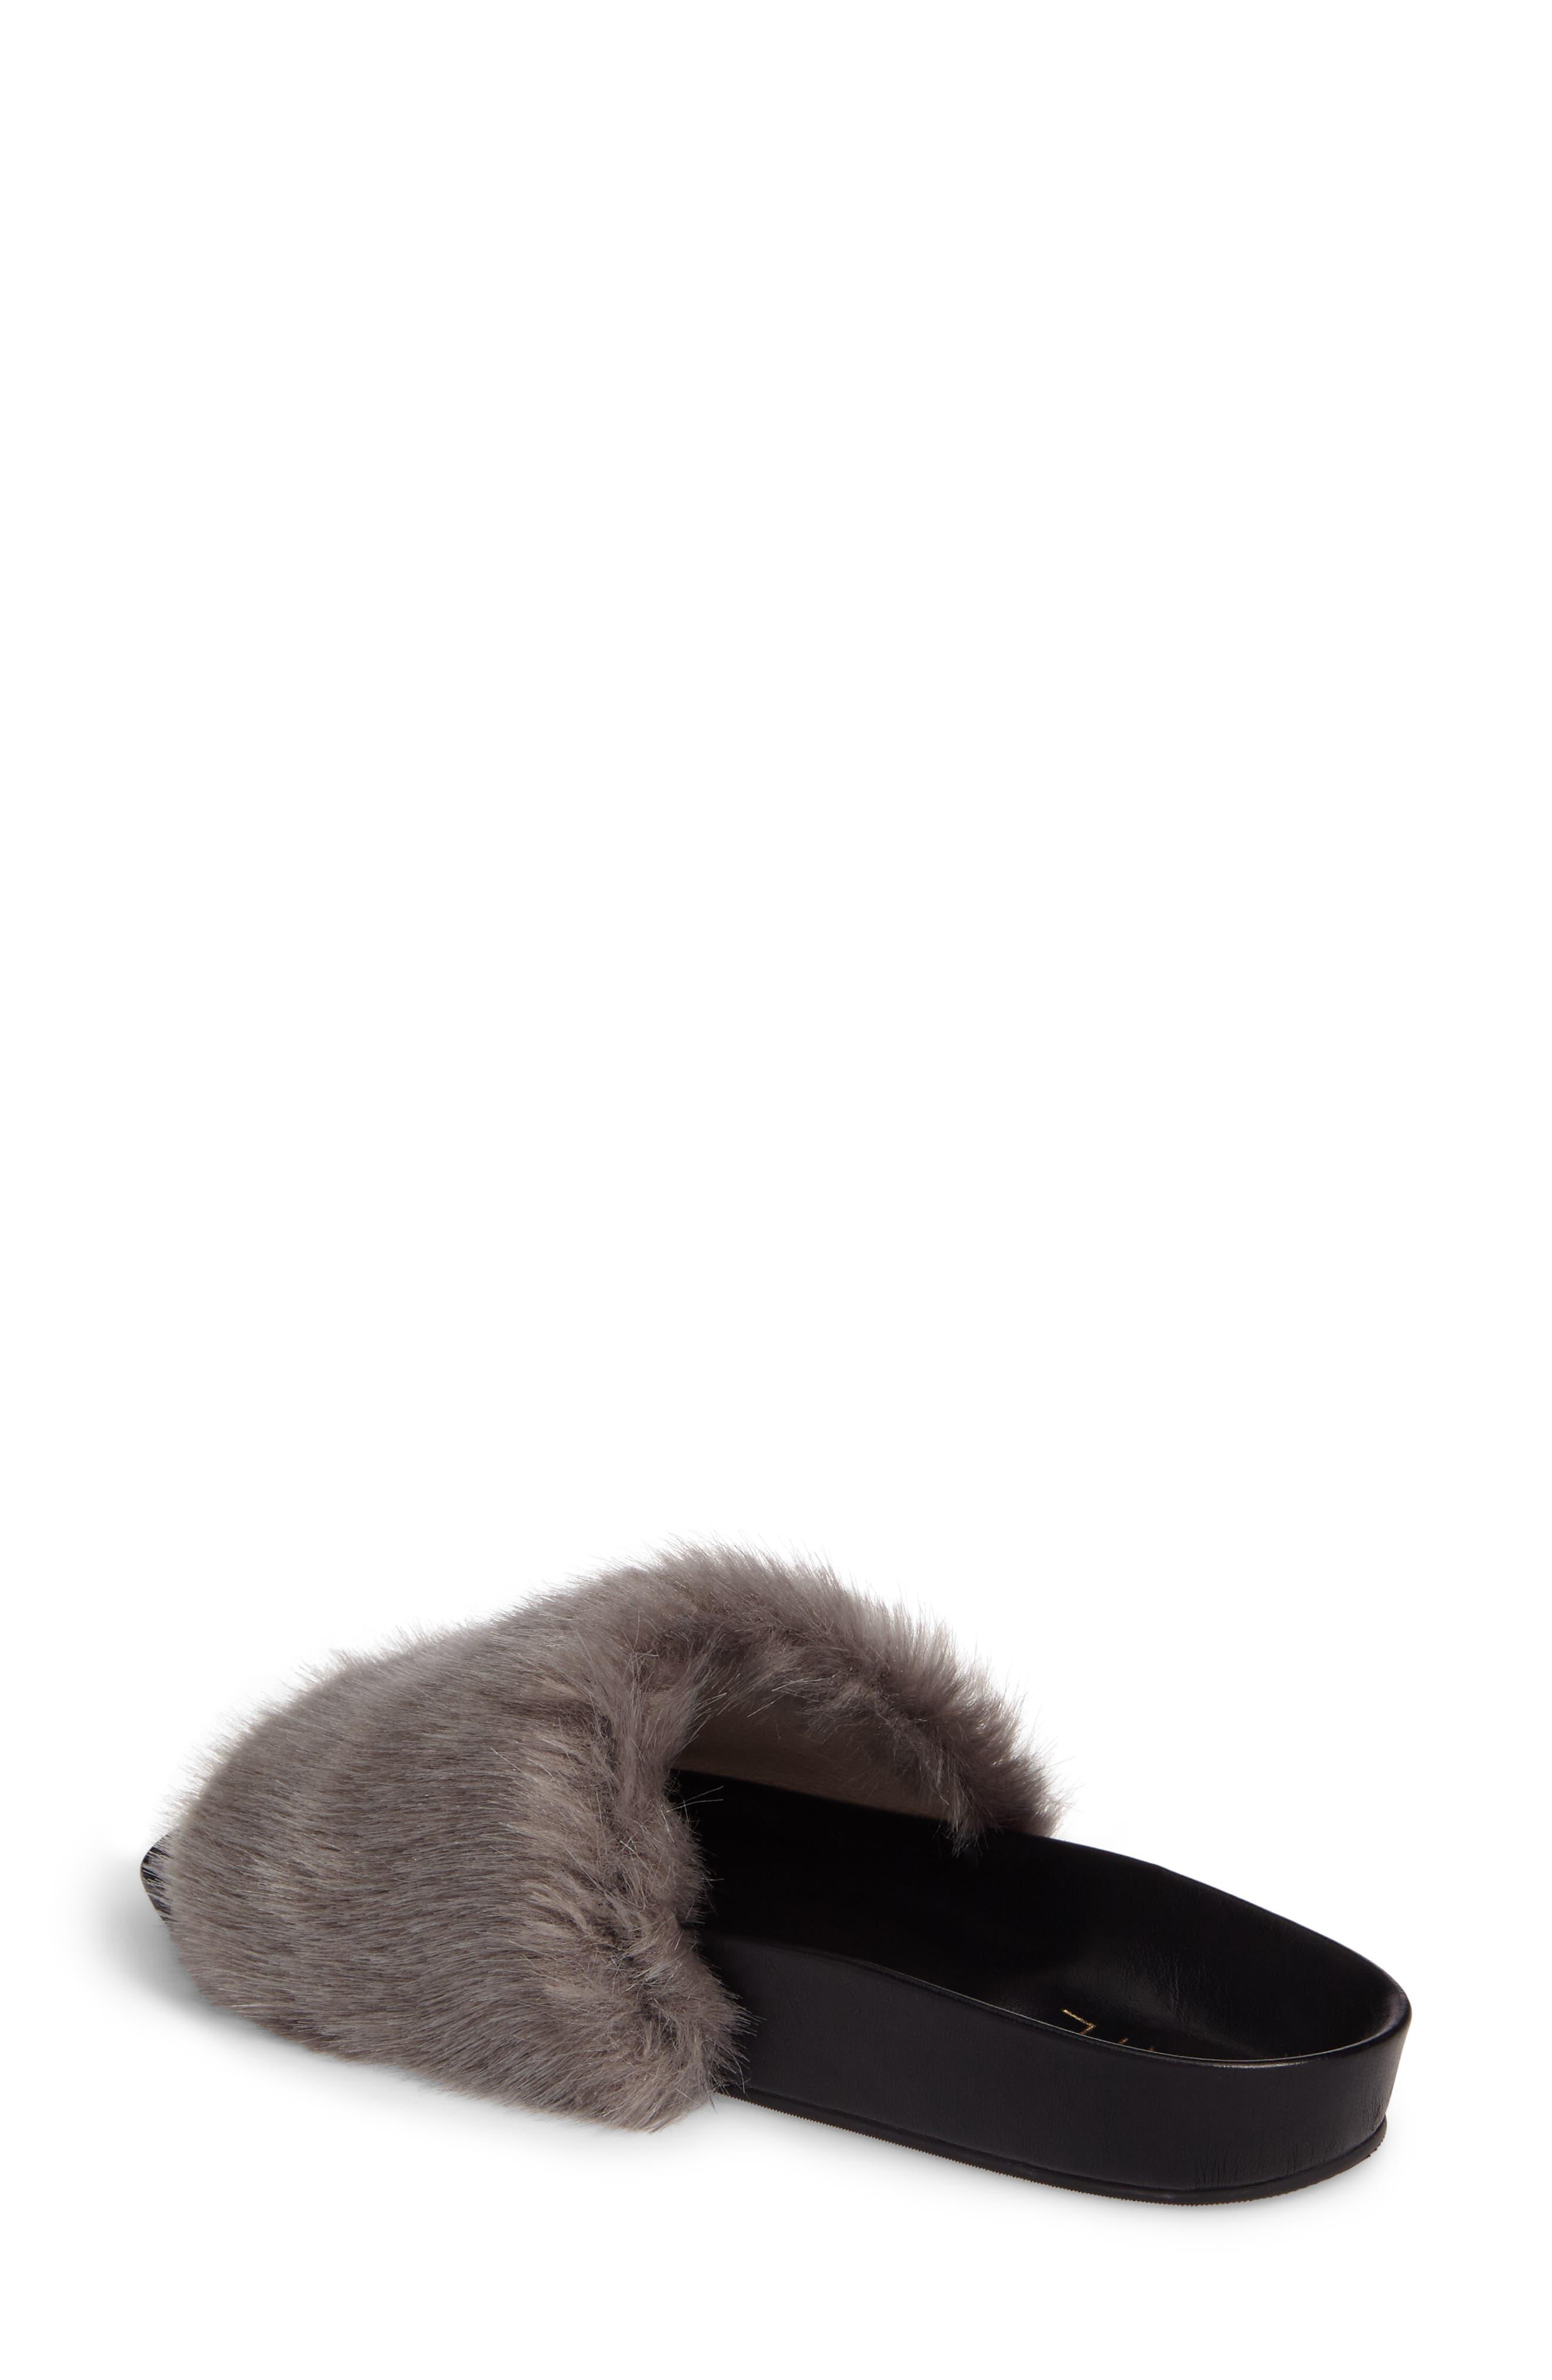 Sirius Faux Fur Slide,                             Alternate thumbnail 2, color,                             Silver Fur